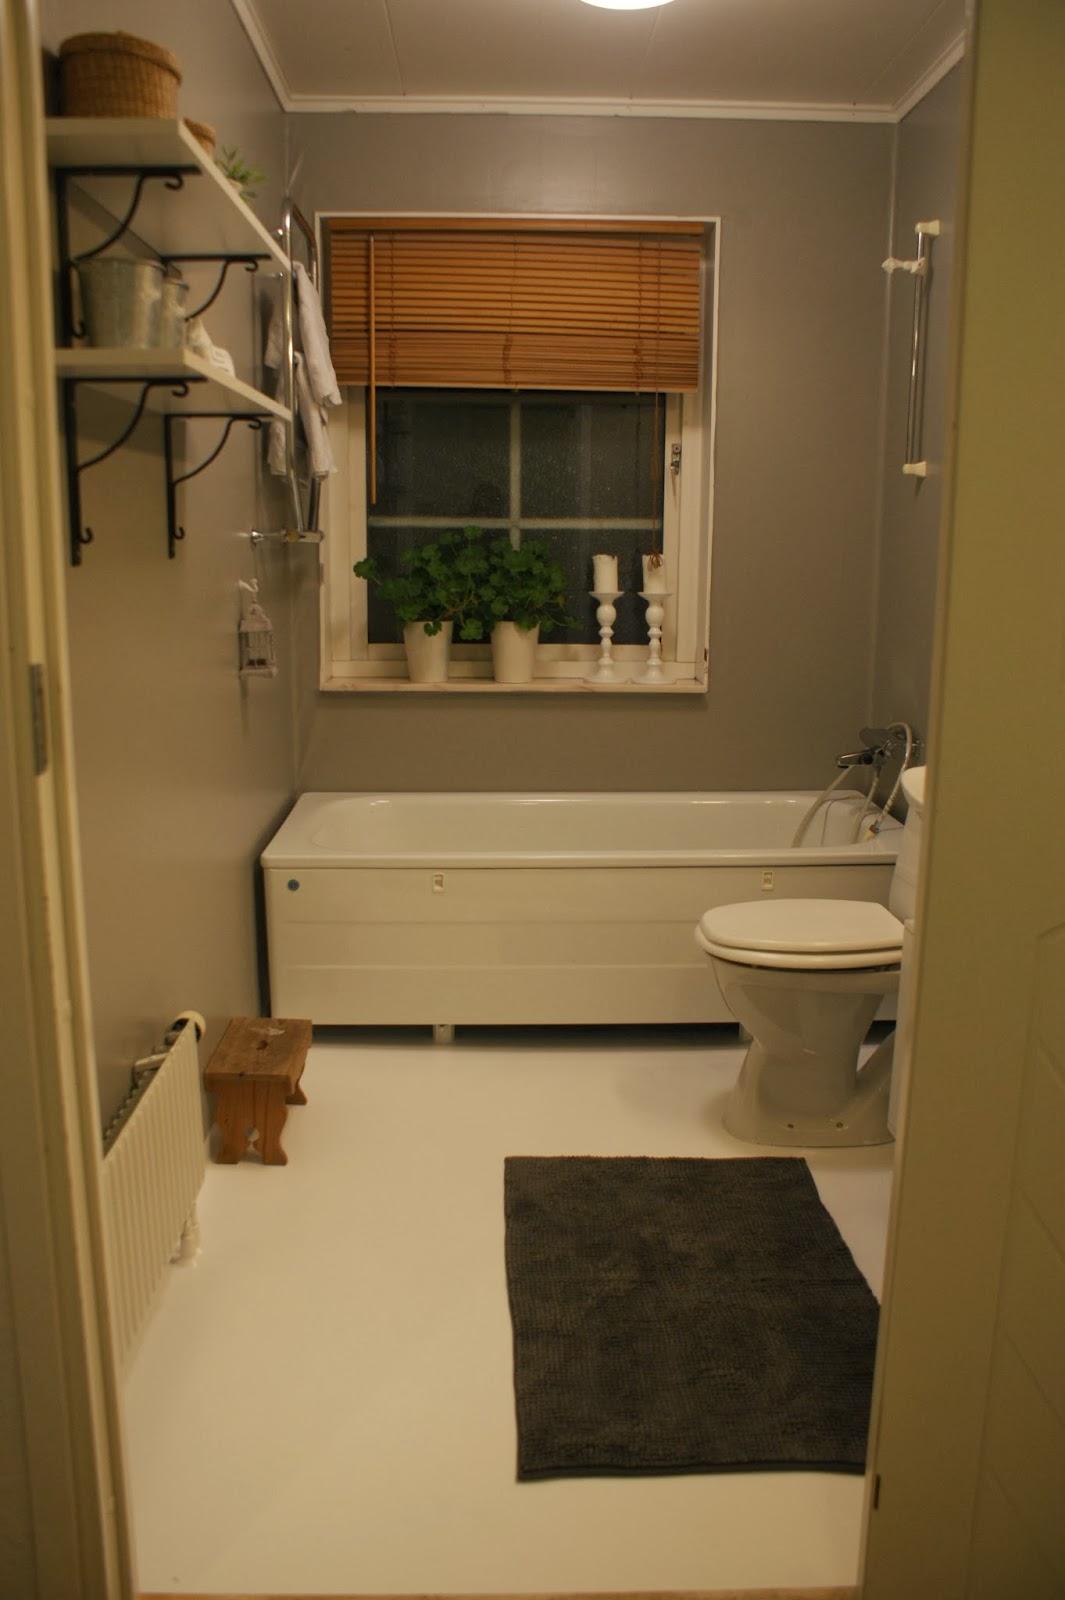 Sockerpärlan: DIY - måla badrum